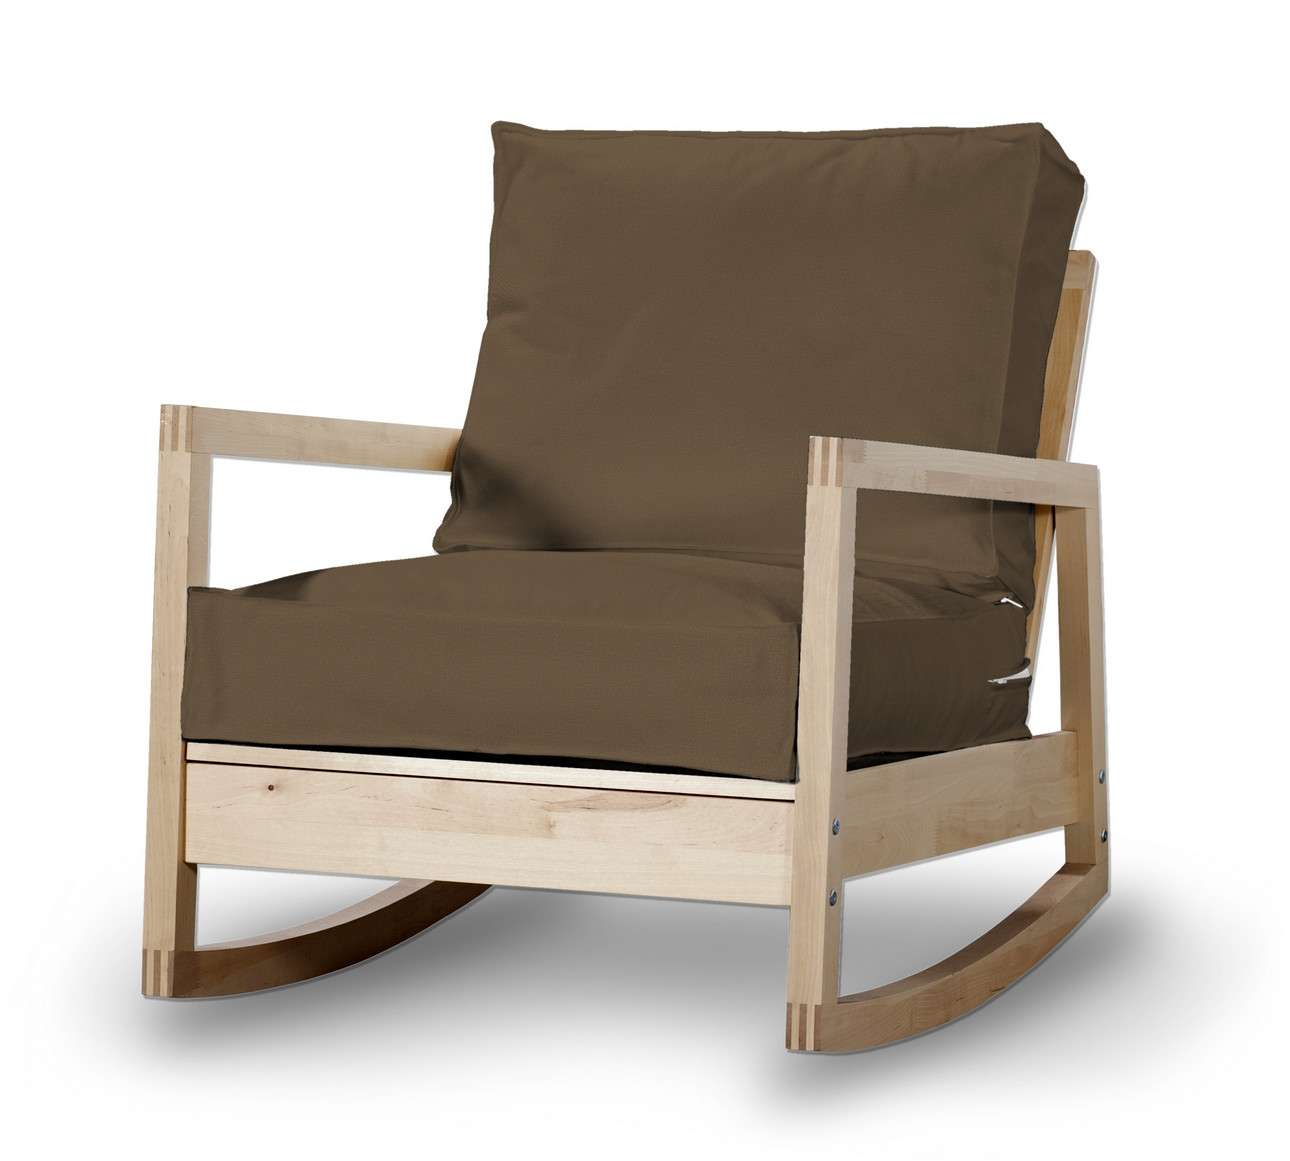 Pokrowiec na fotel Lillberg w kolekcji Living, tkanina: 160-94